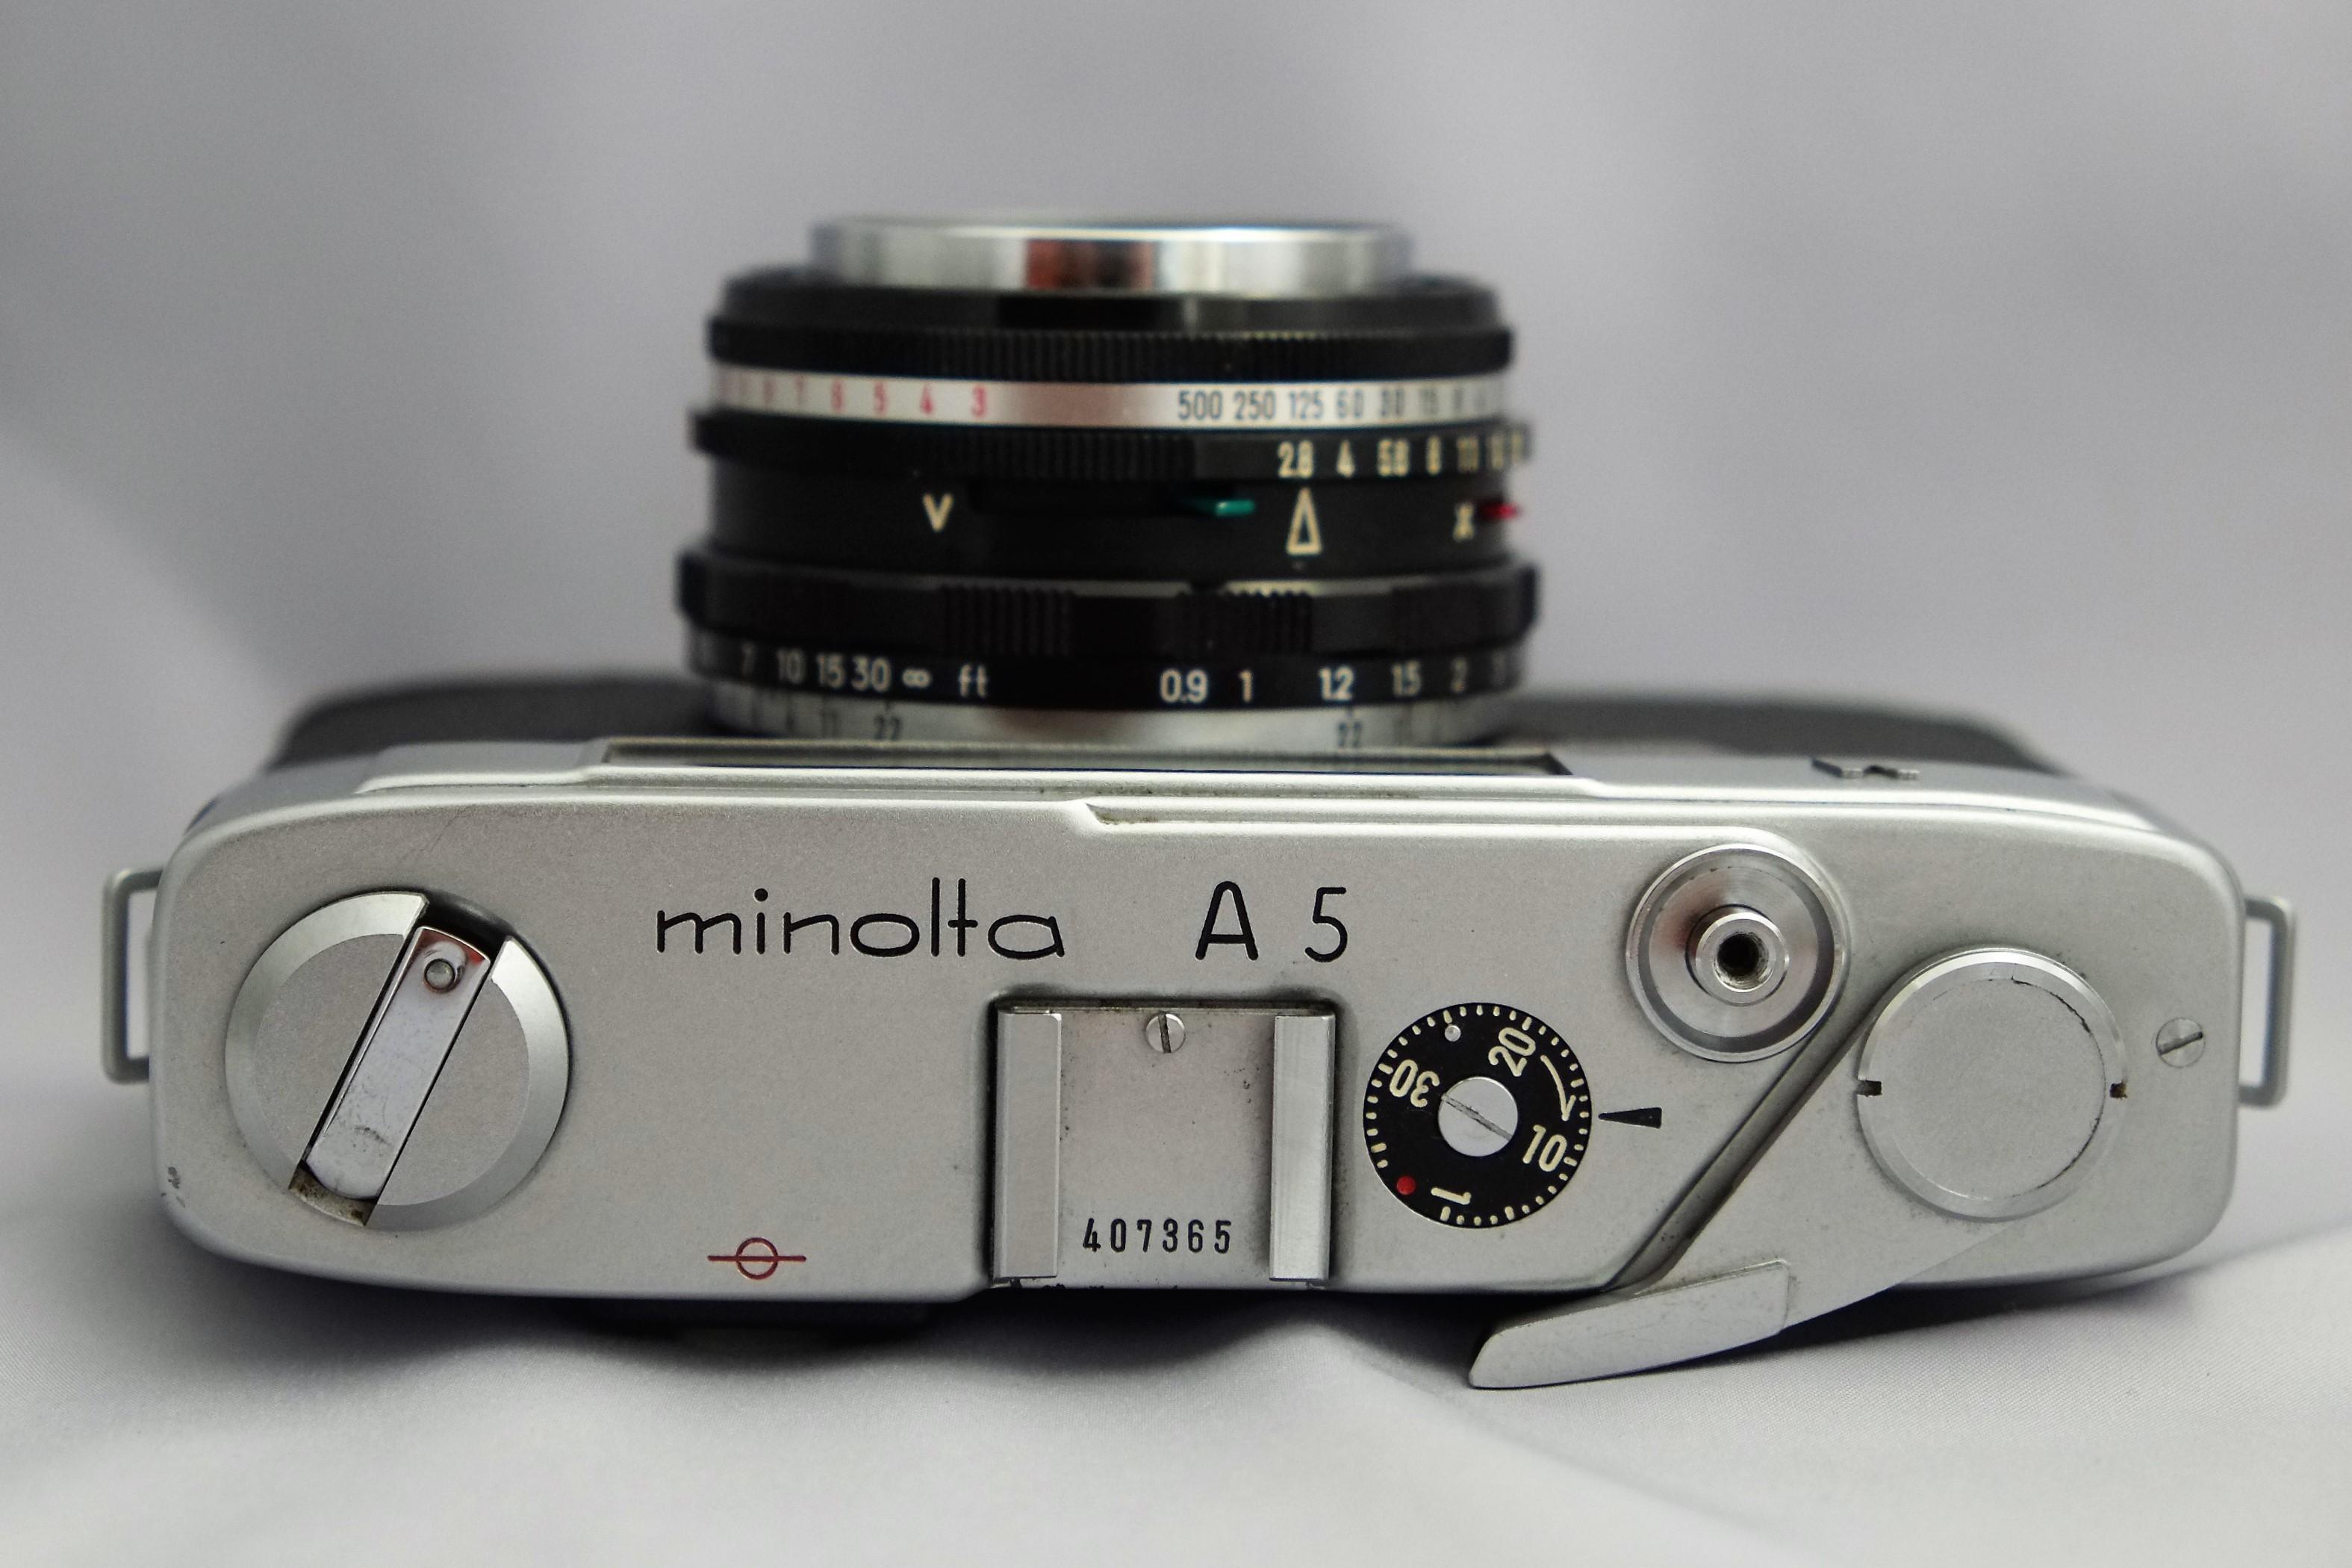 mioltaA508.jpg